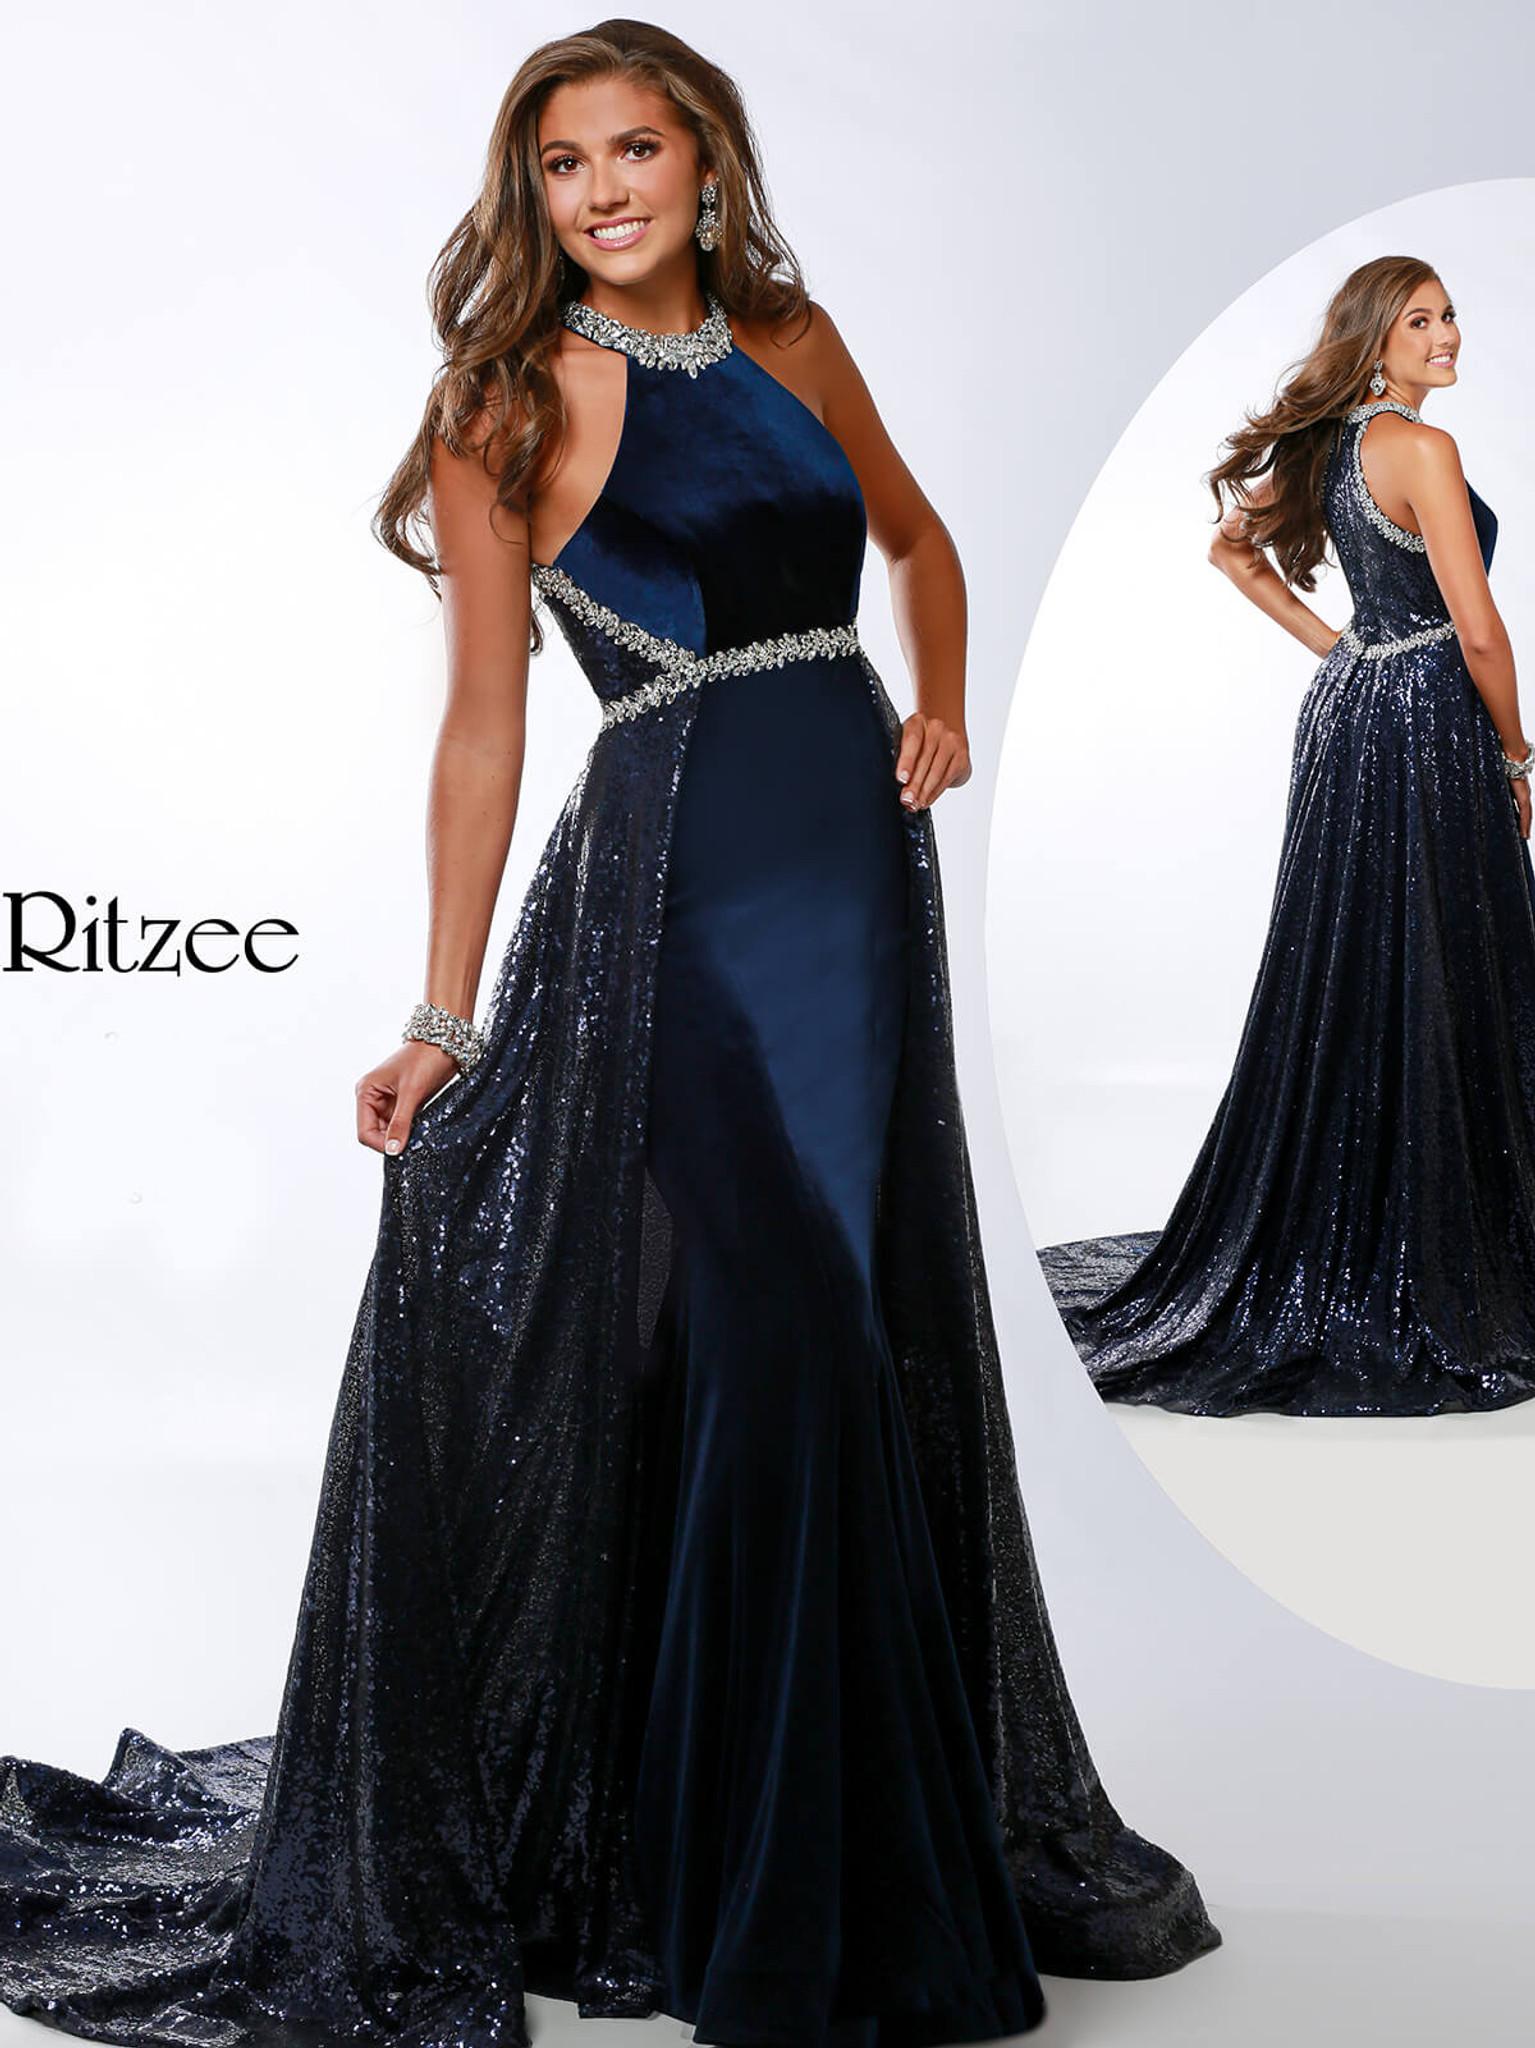 A-line Ritzee Originals 3633 Pageant Dress PageantDesigns